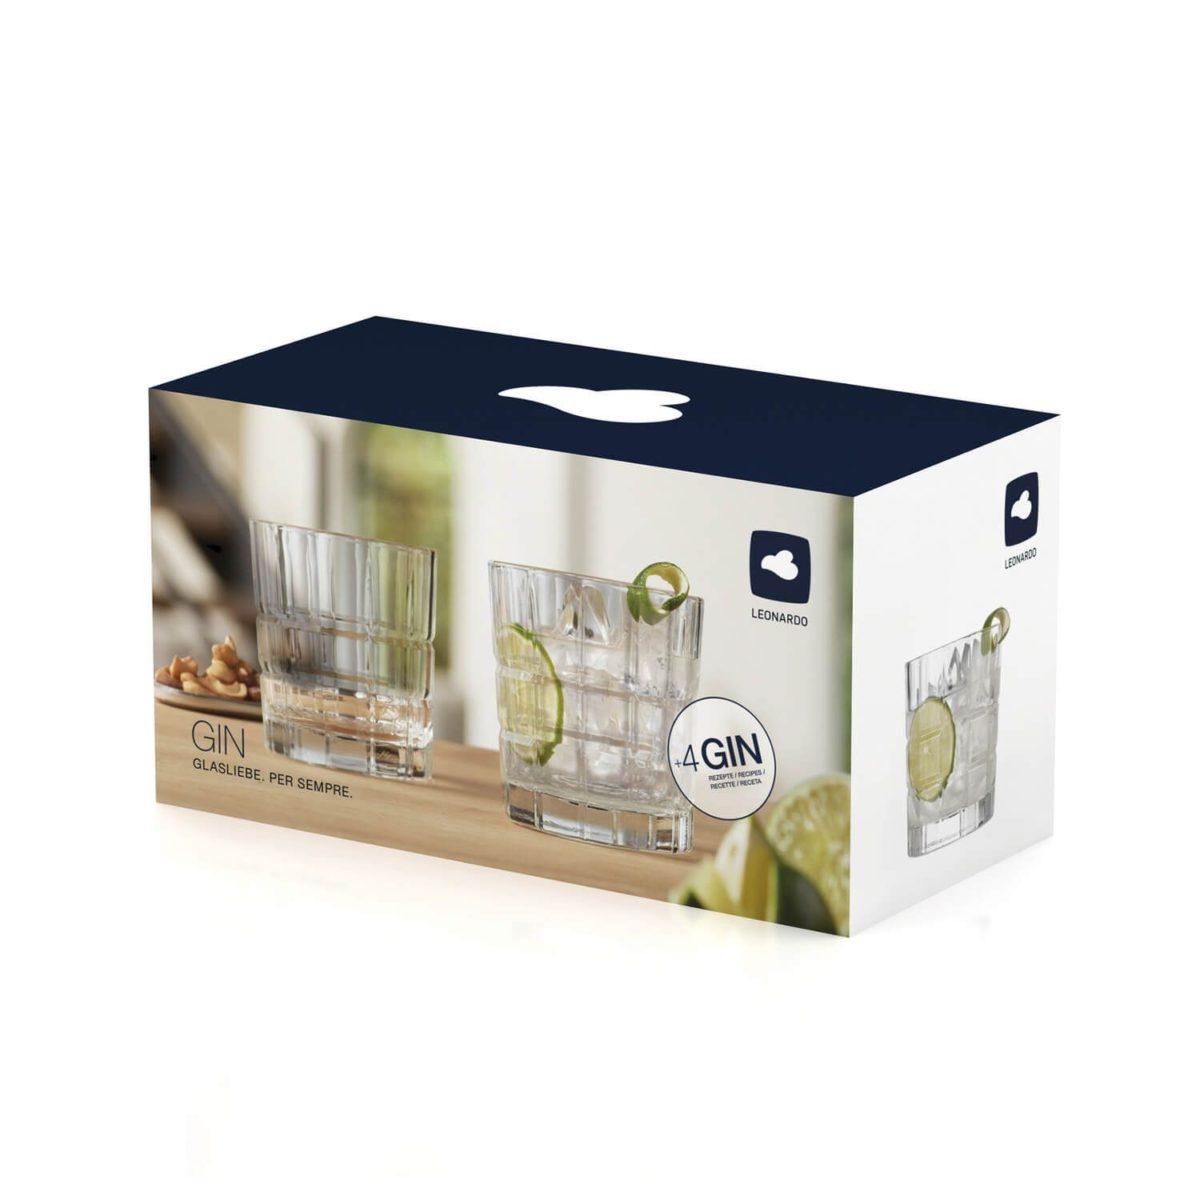 022775 9 k 1200x1200 - Set pahare pentru Gin whisky 2 pcs. (L022775)